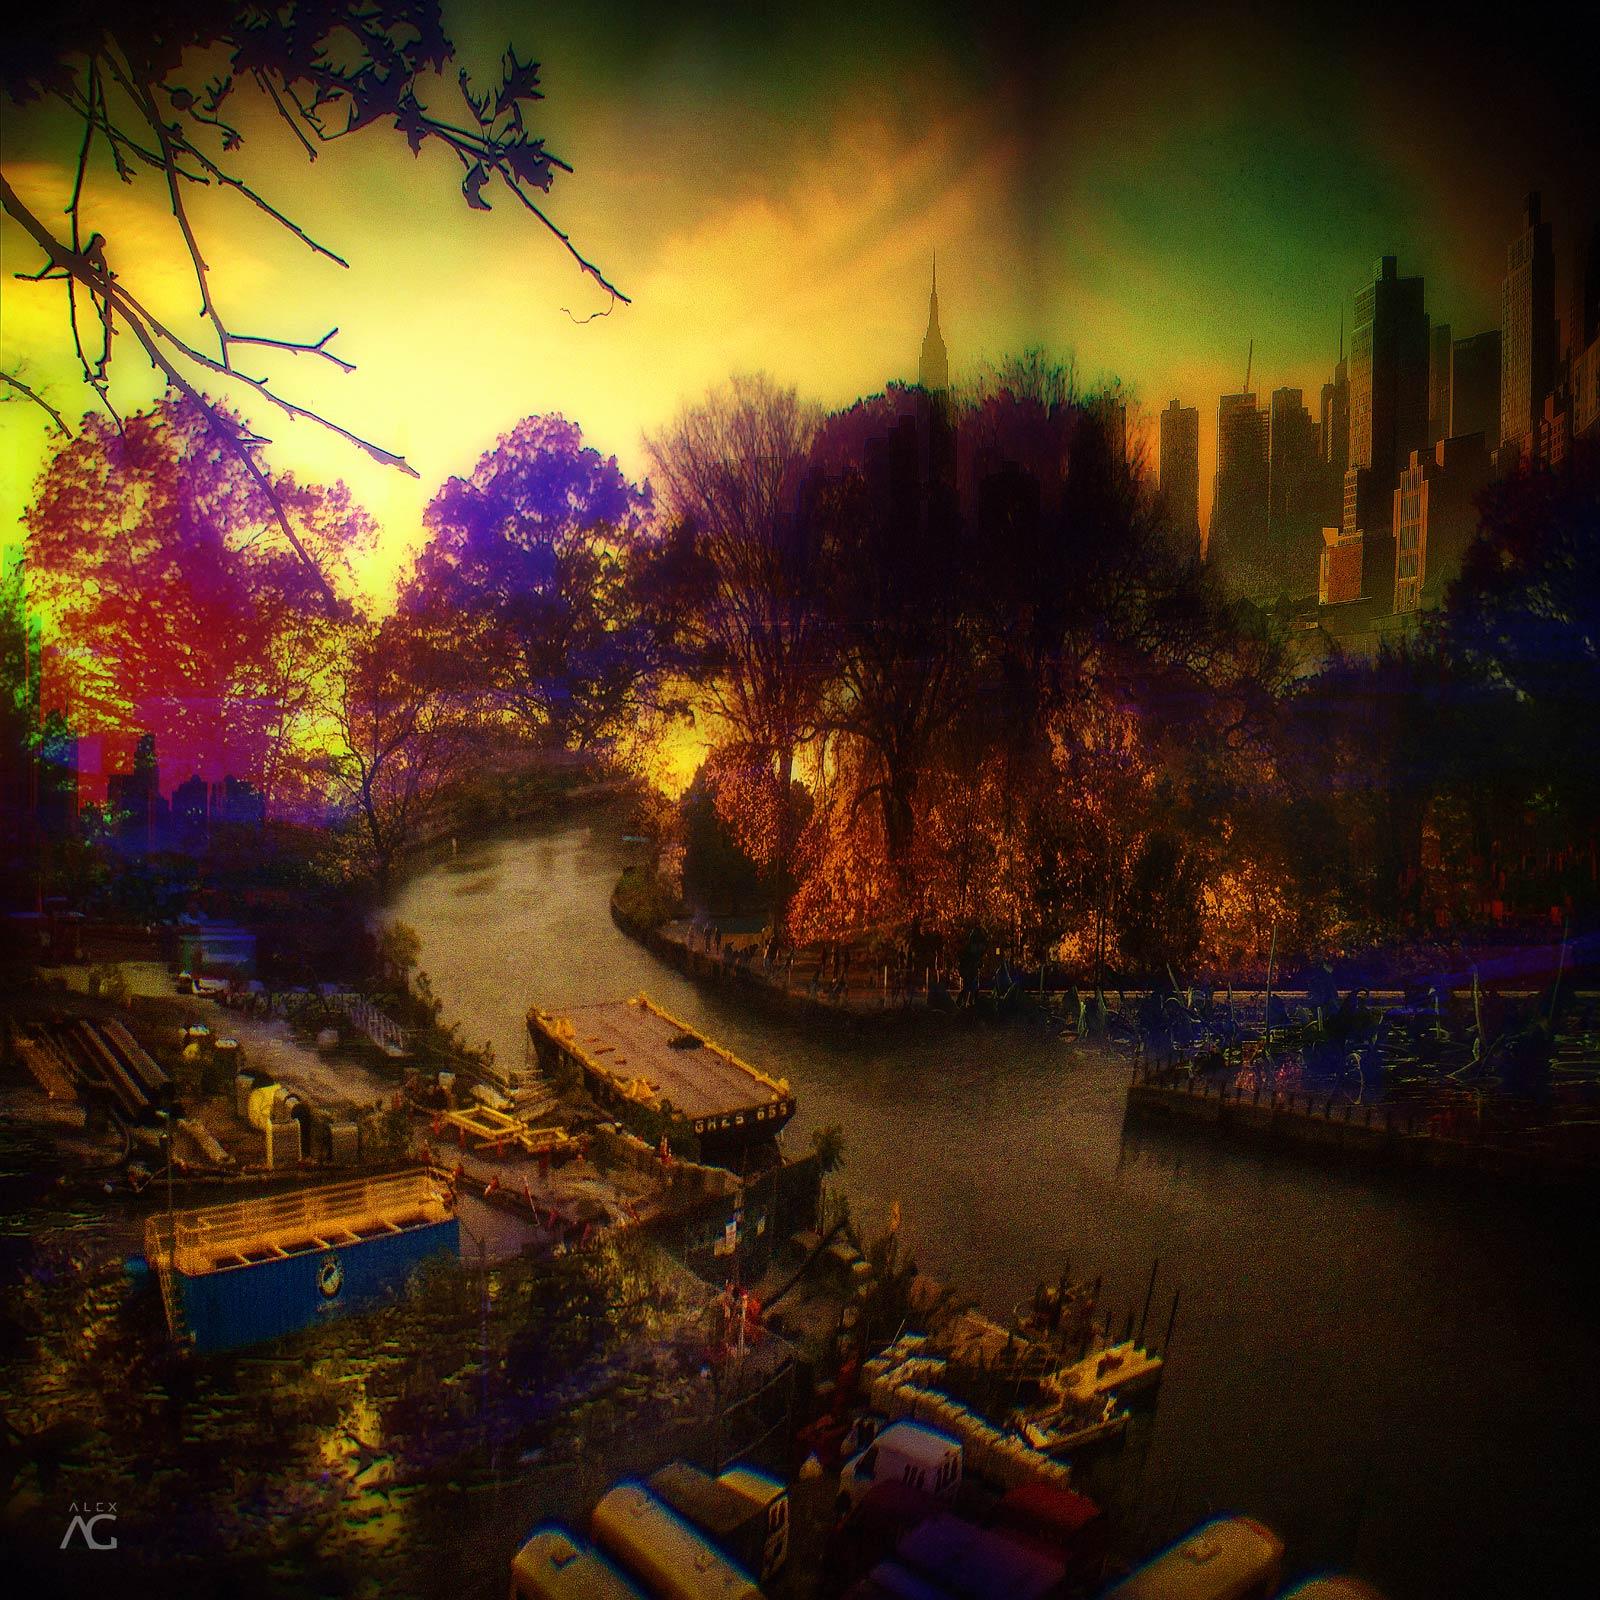 AutumnColorsInCentralParkByTheLake_Romanika_channelsMixed